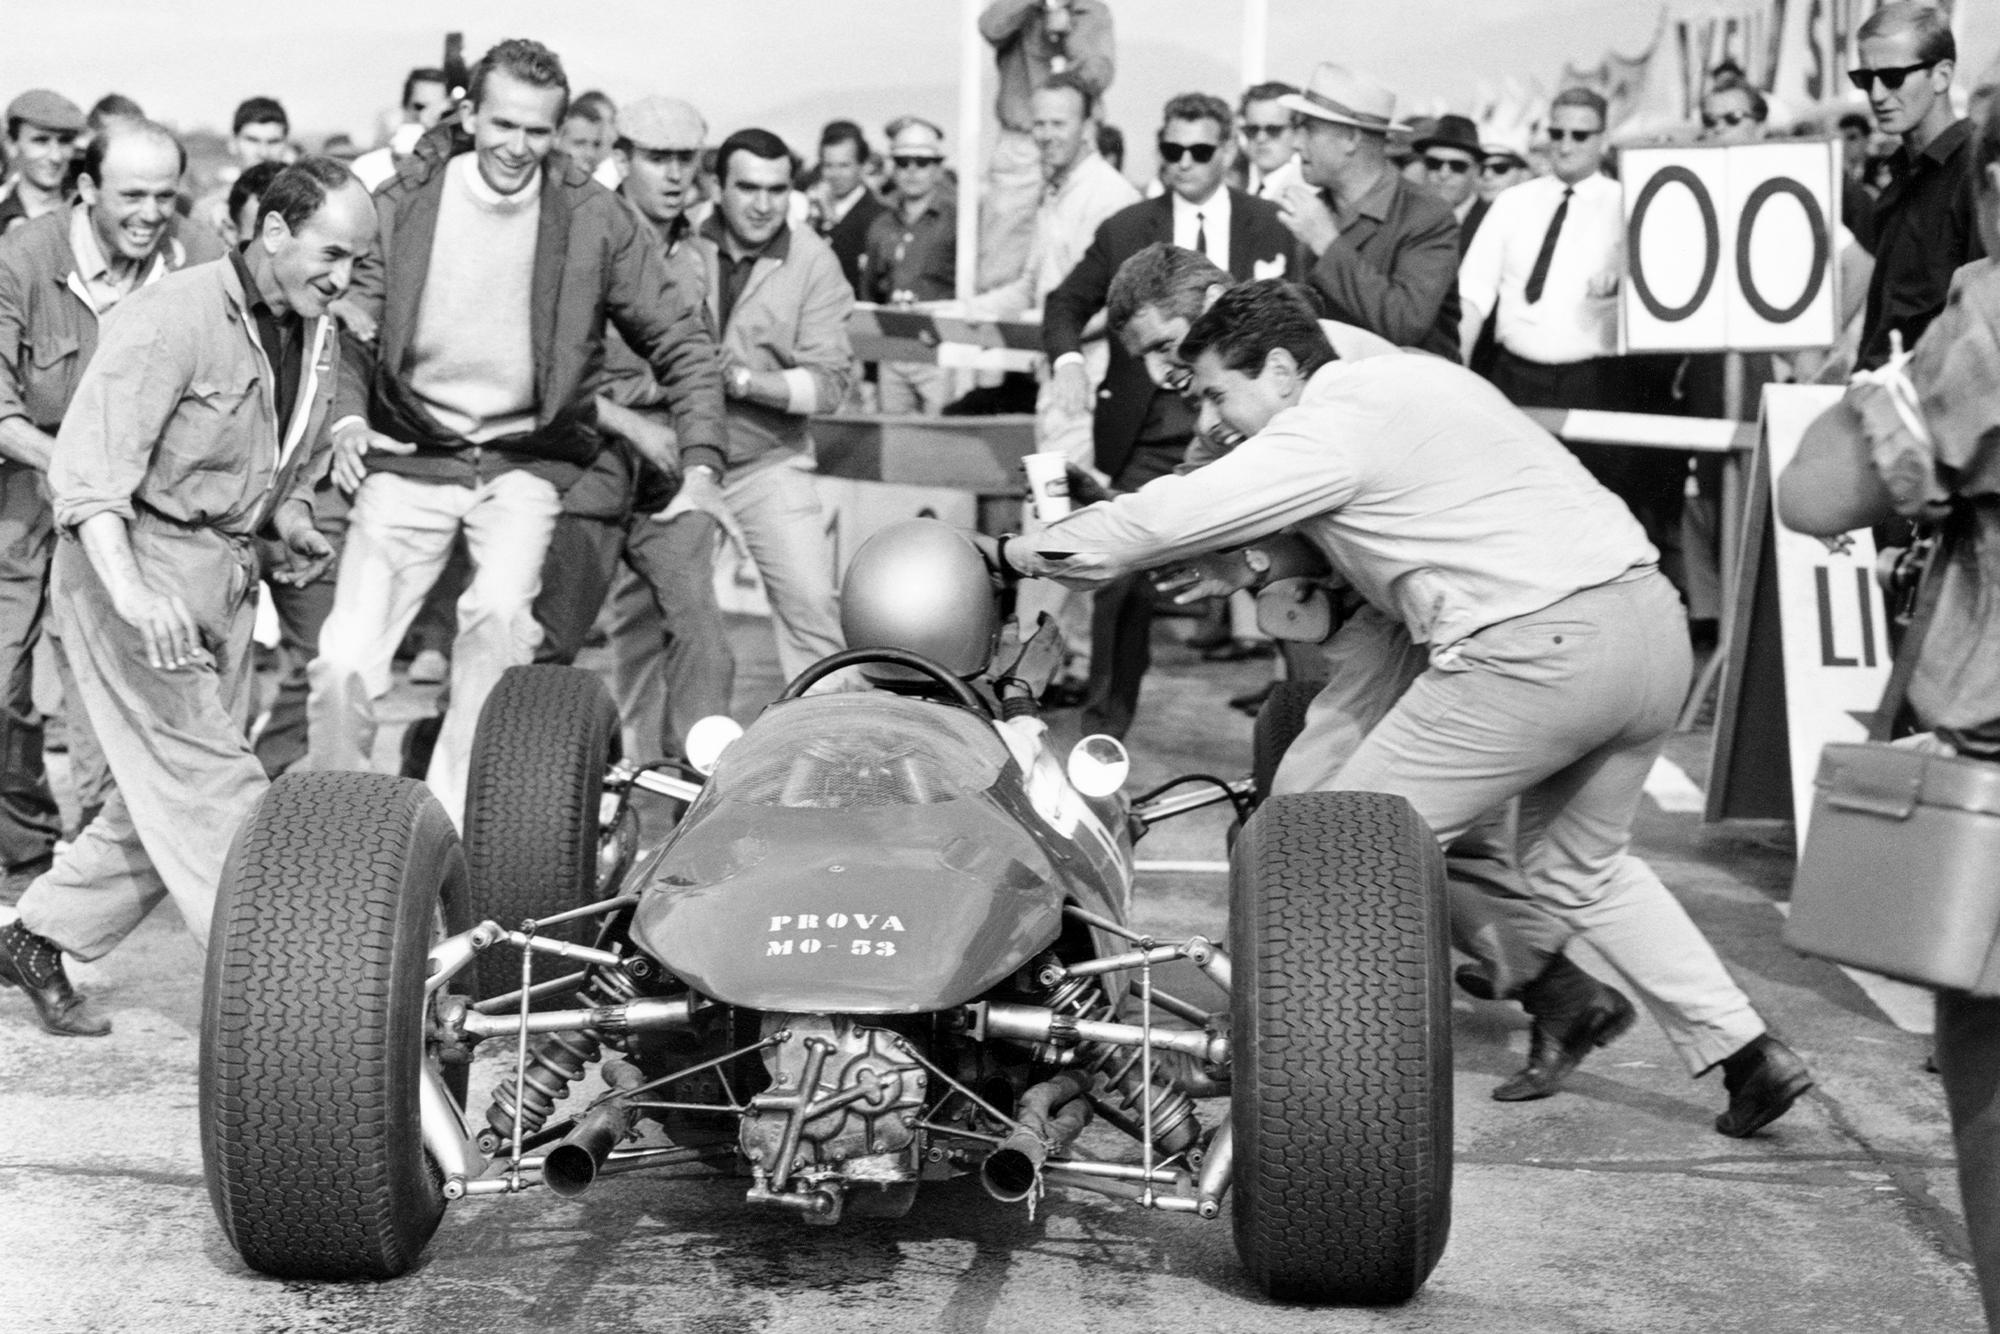 Lorenzo Bandini (Ferrari 156) enters the pits upon winning the race.